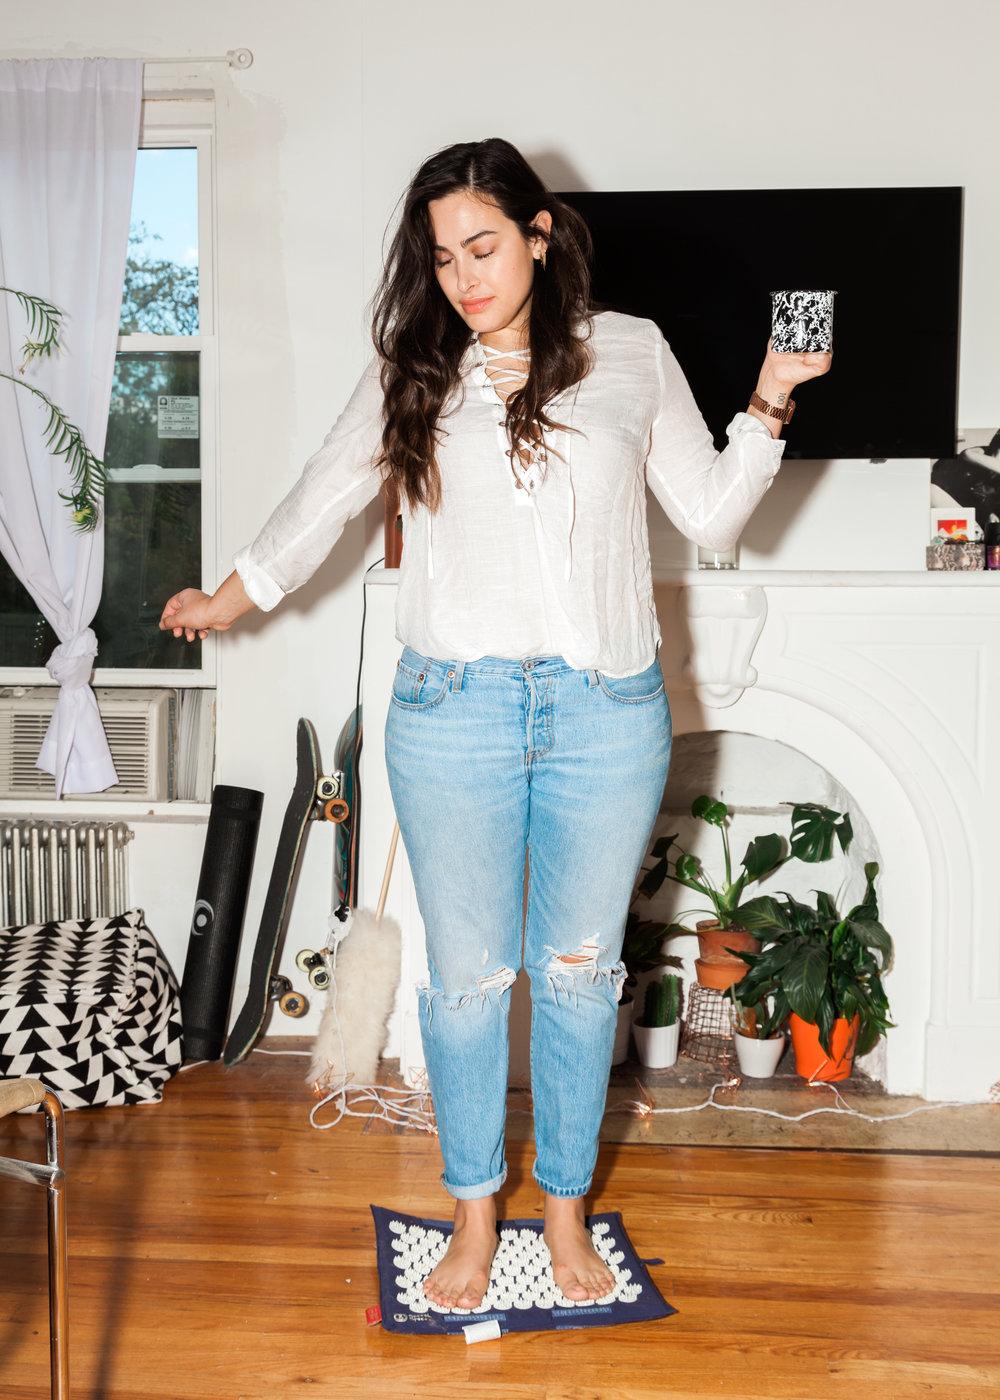 Top, Isabel Marant Etoile ;  Jeans, Levi's  ; Accupressure Mat, Nayoya